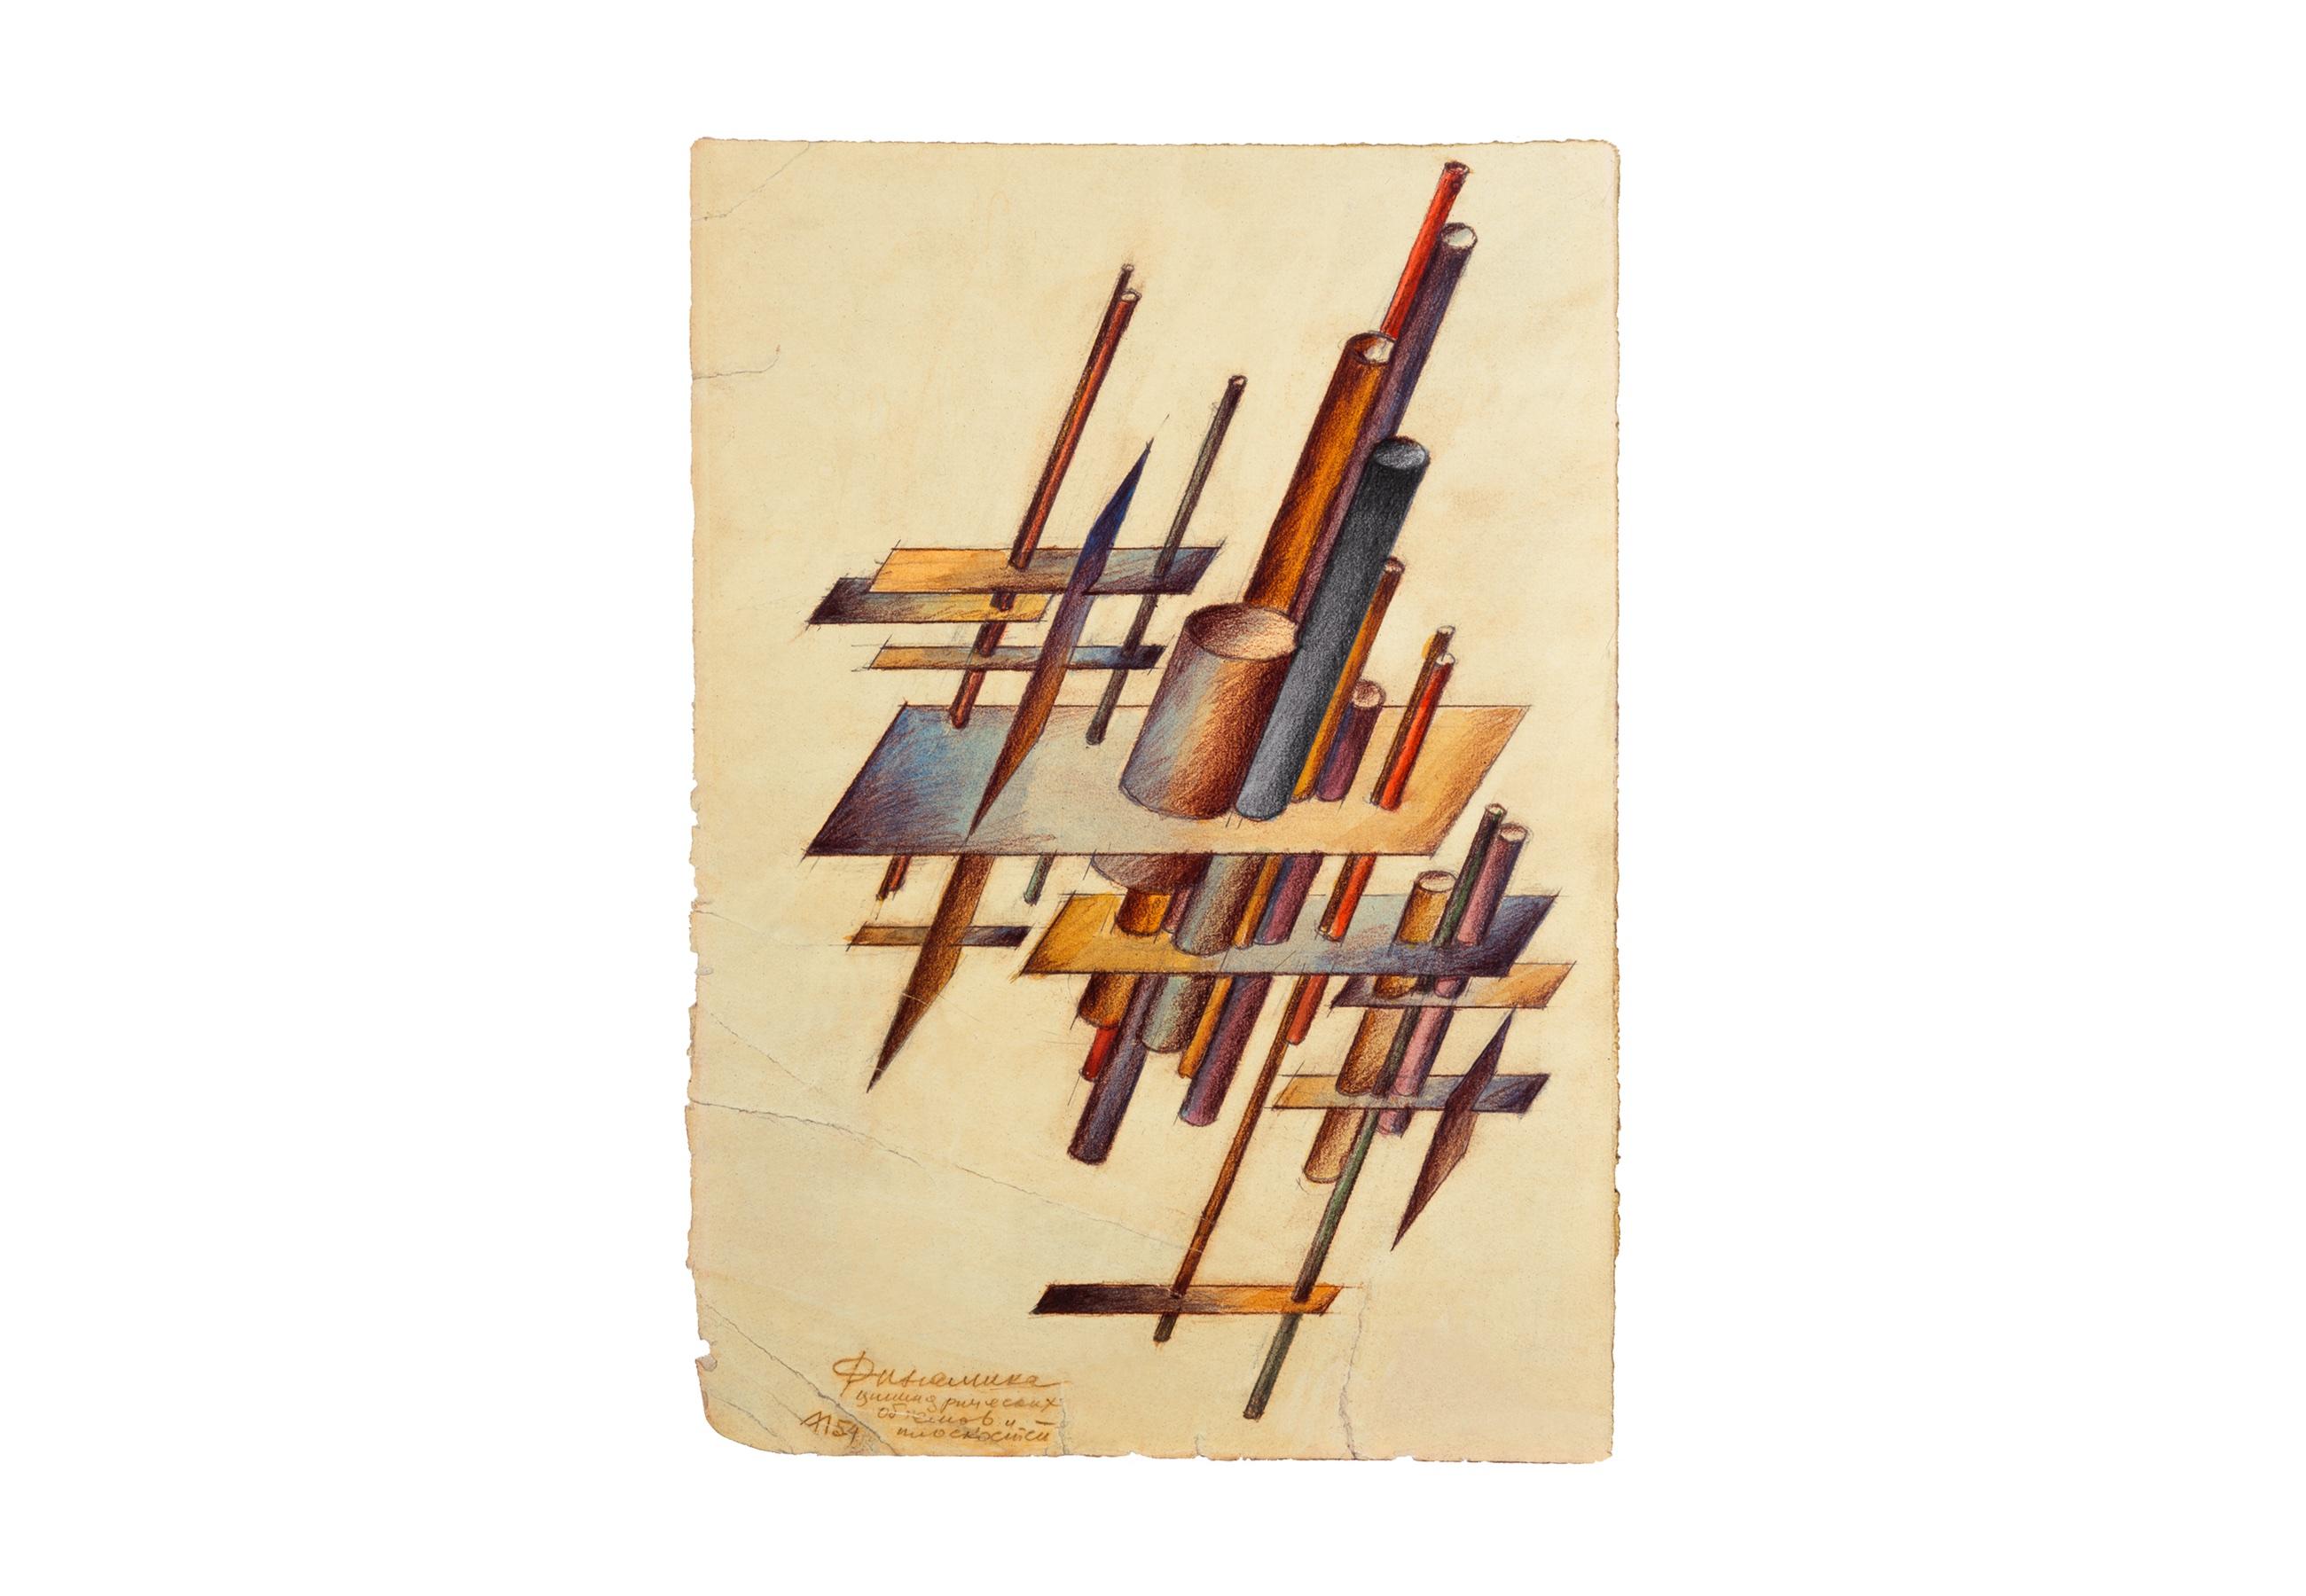 Lamm-Portfolio-1954-1955-07.jpg